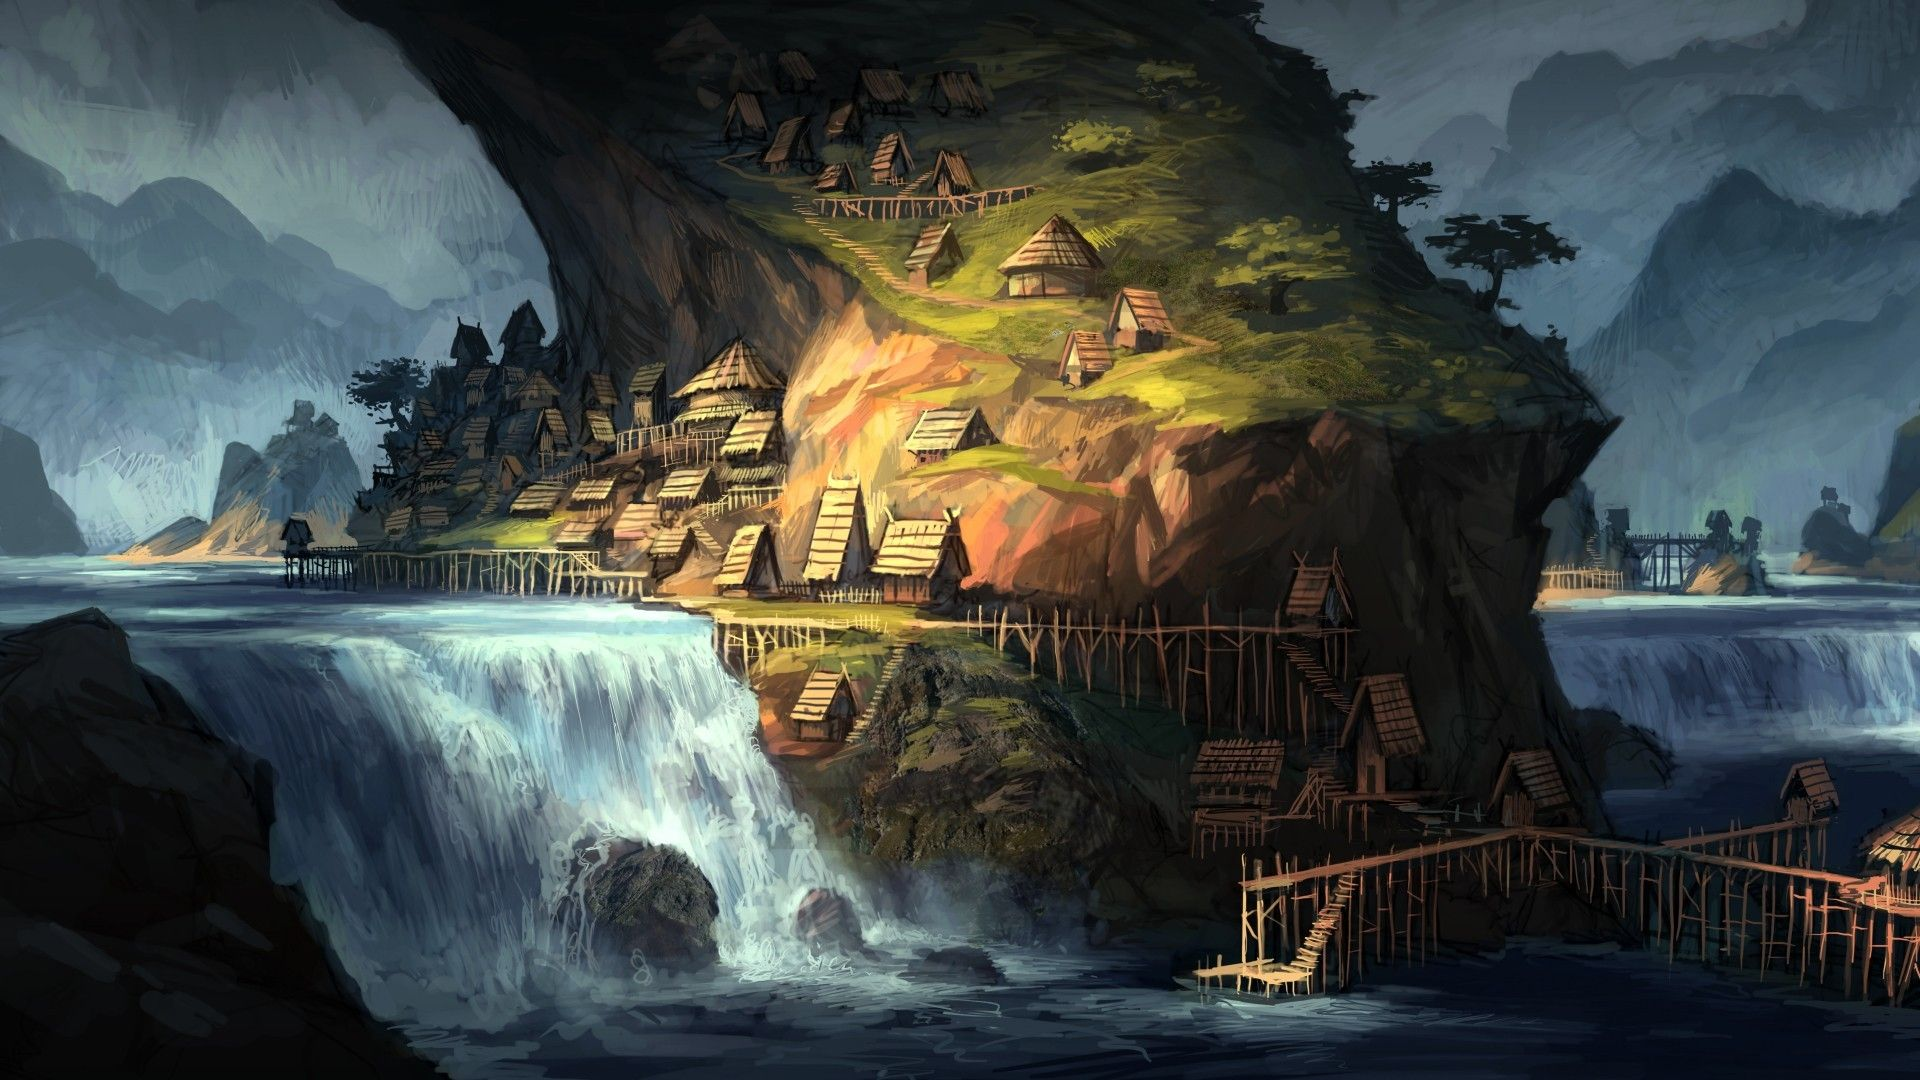 Fantasy Art House Waterfall Water Digital Art